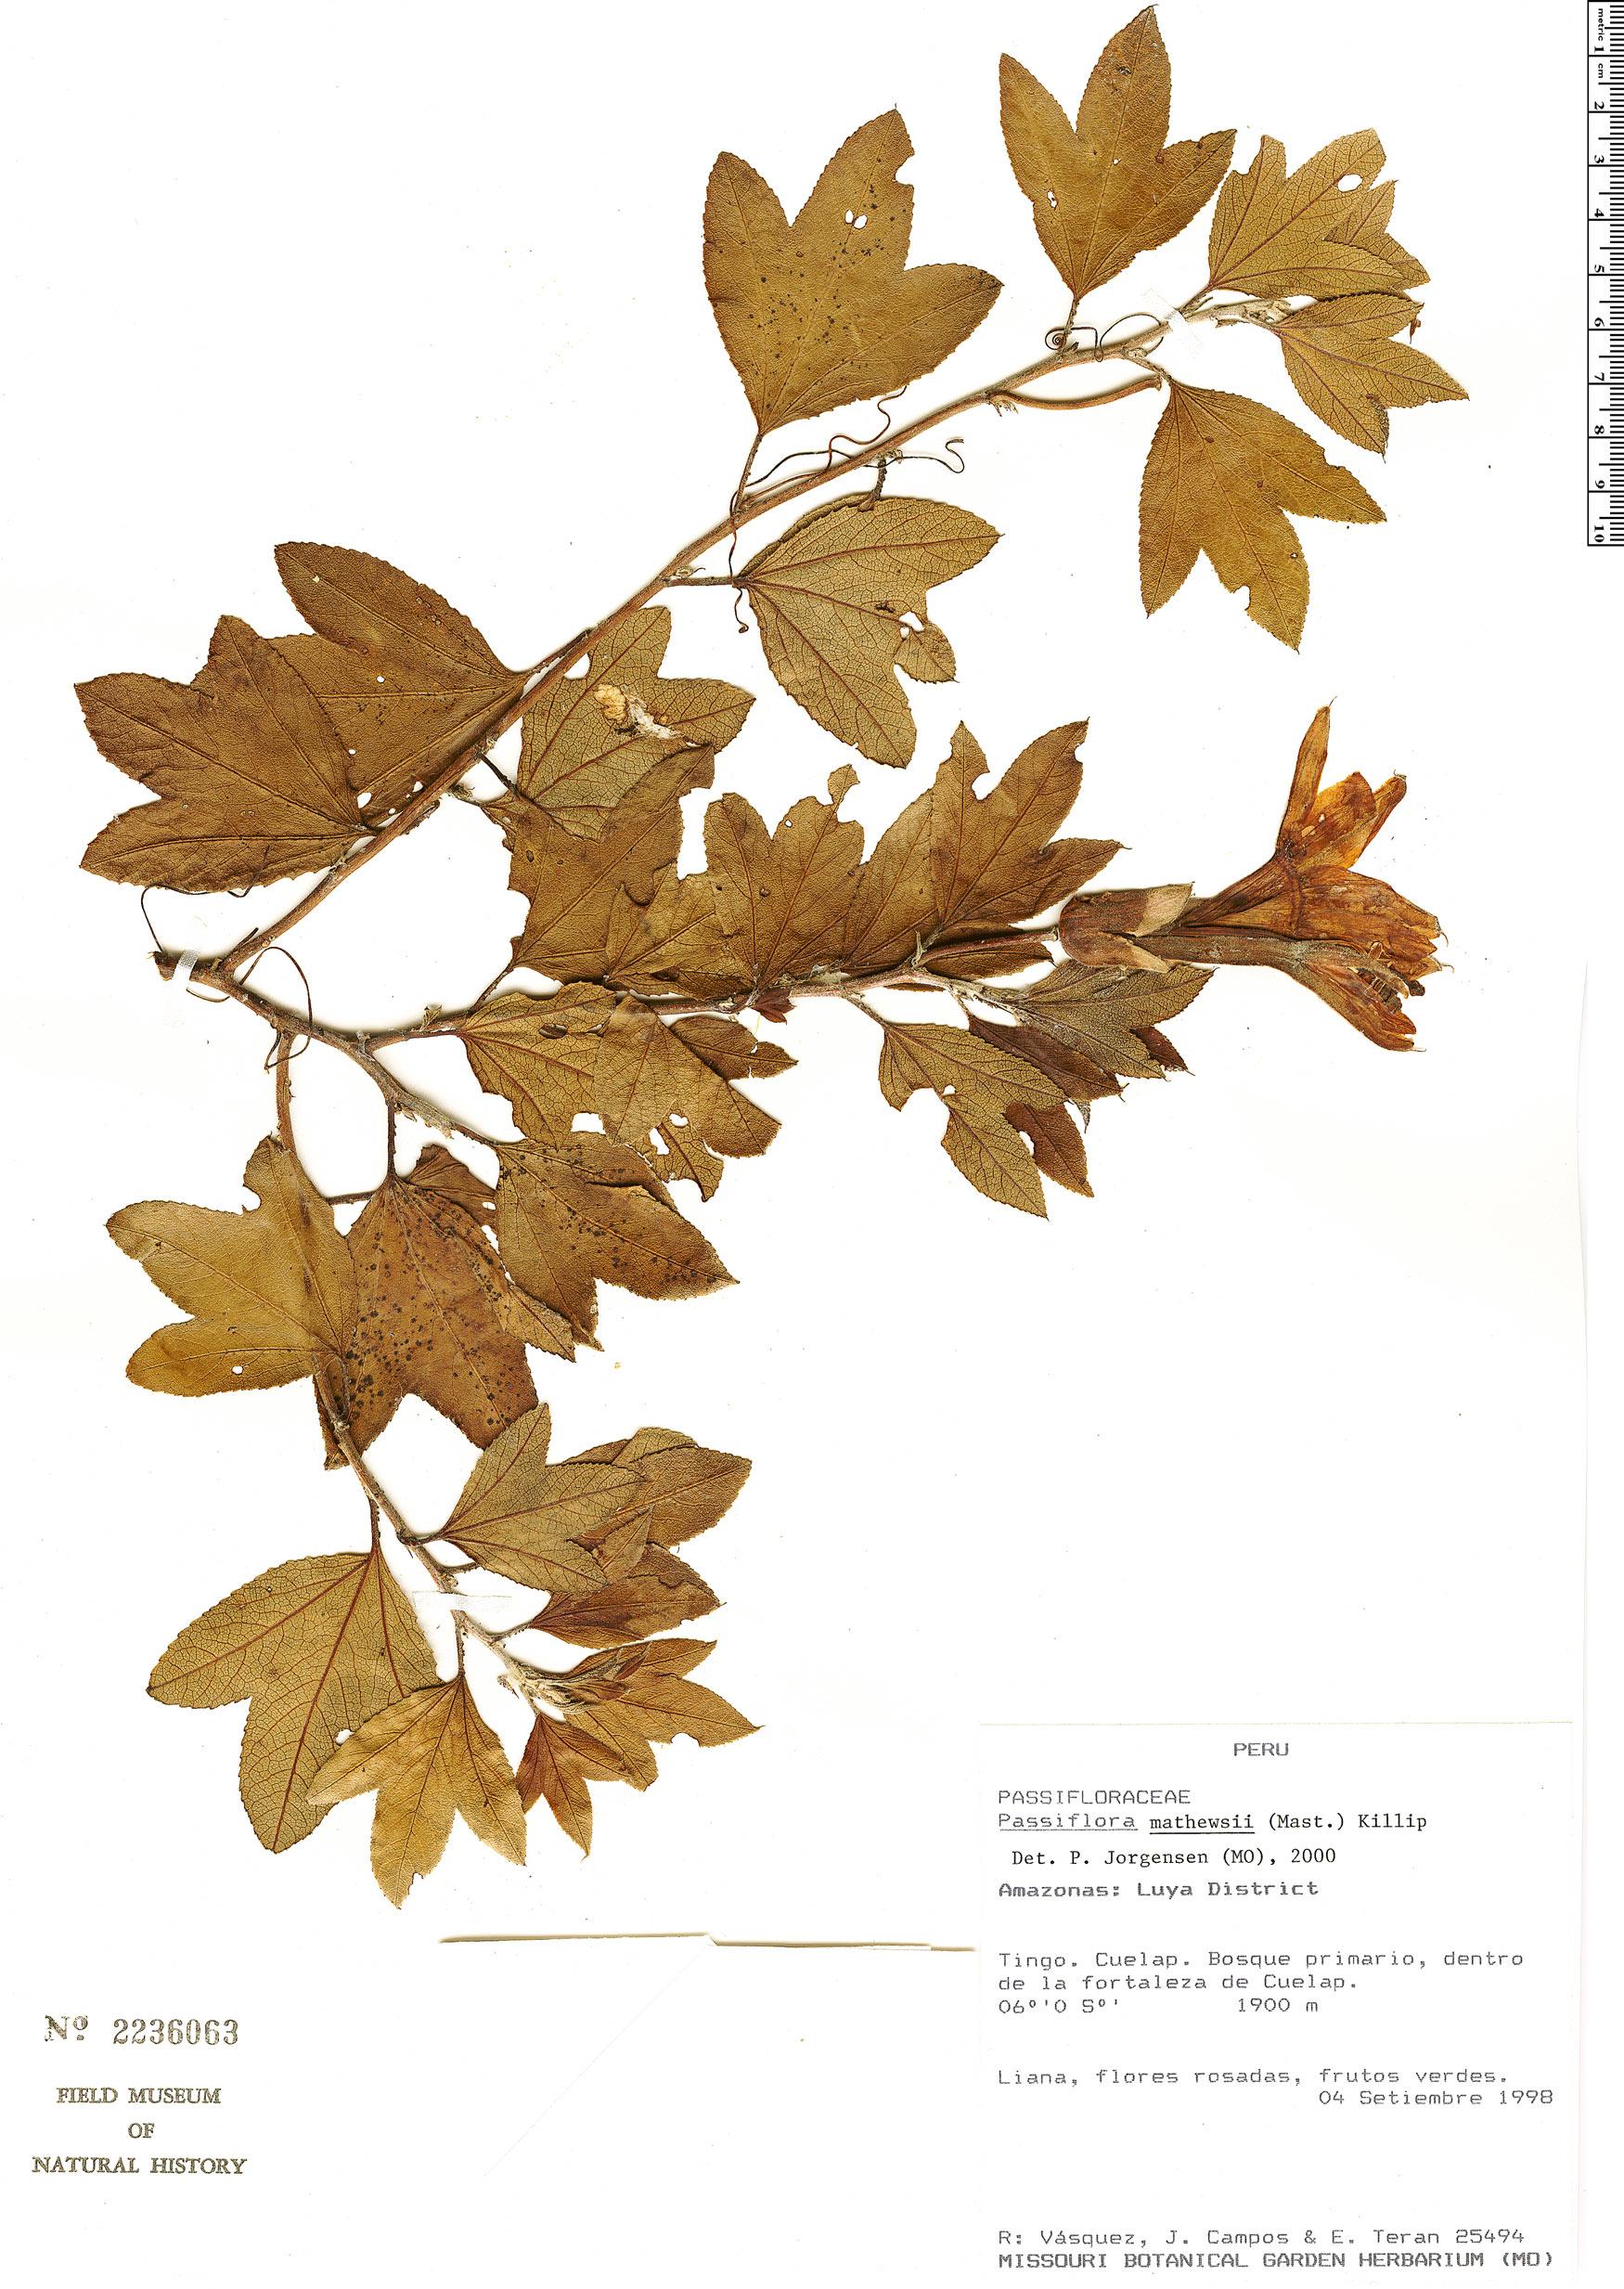 Specimen: Passiflora mathewsii